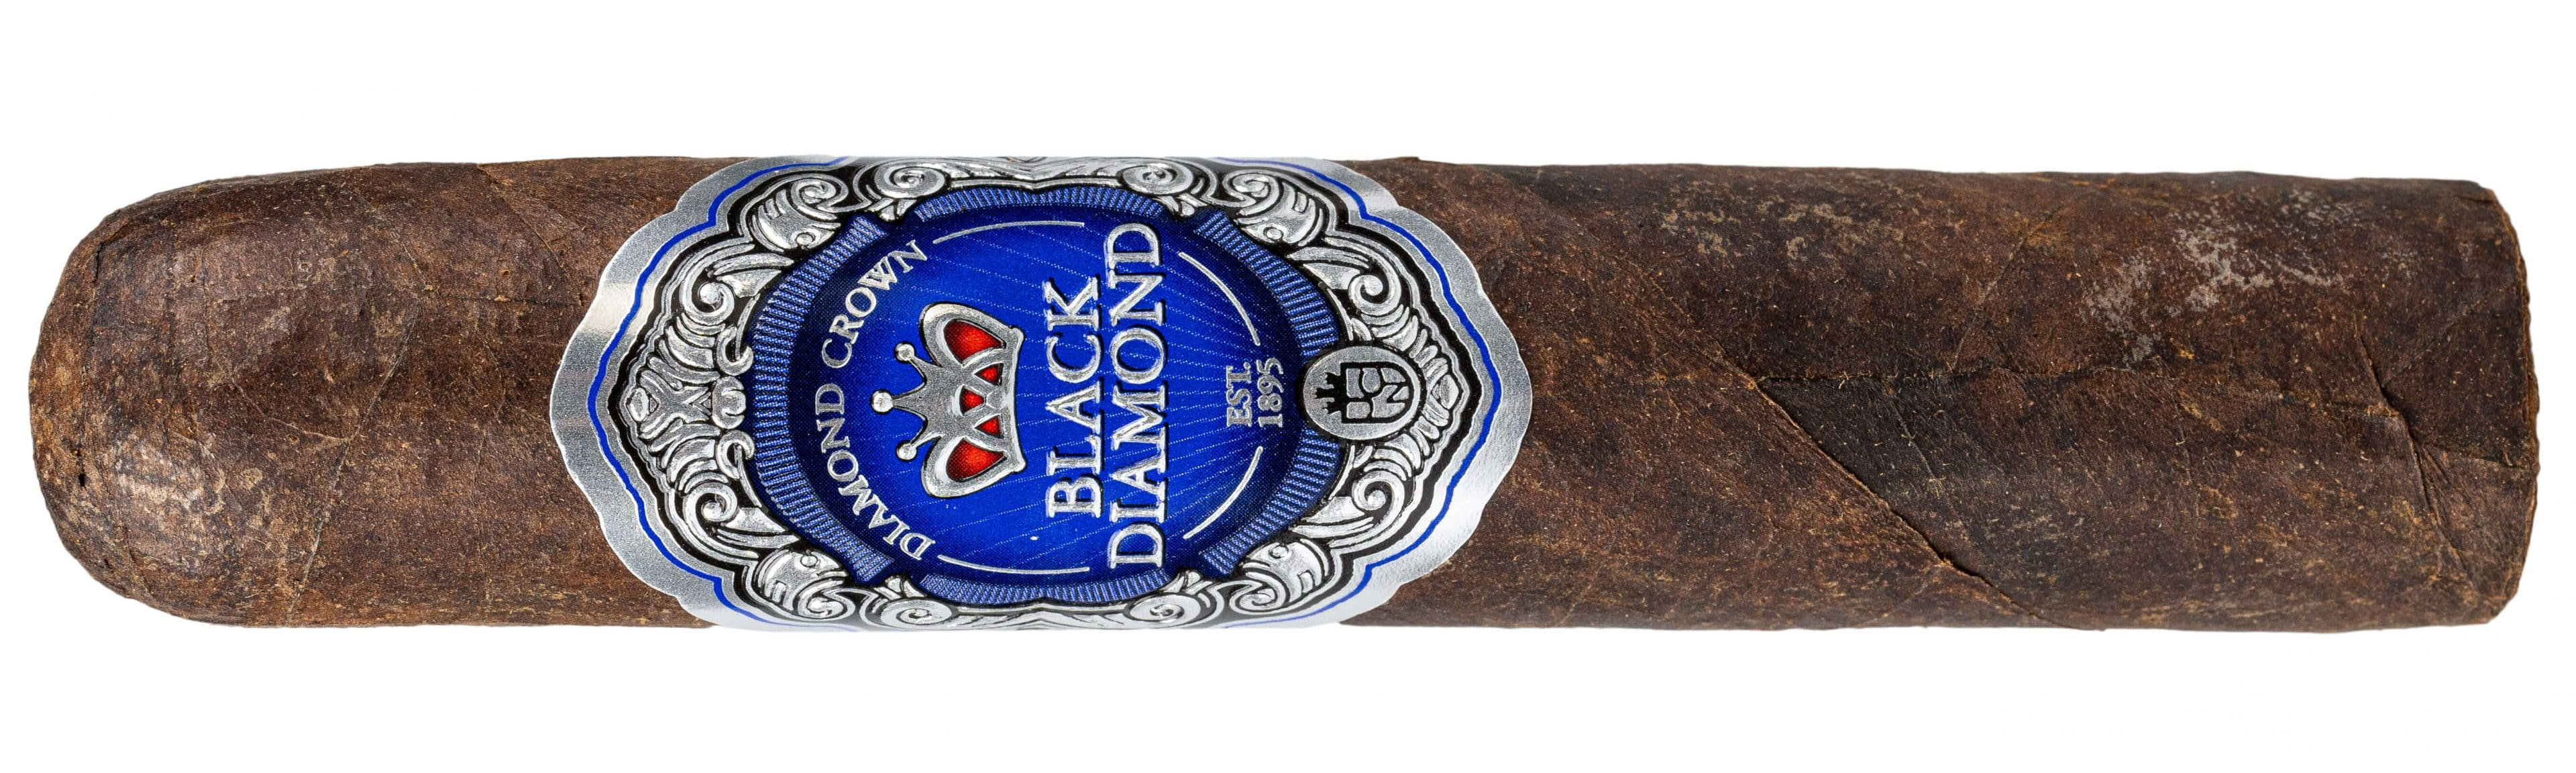 Blind Cigar Review: Diamond Crown | Black Diamond Marquis